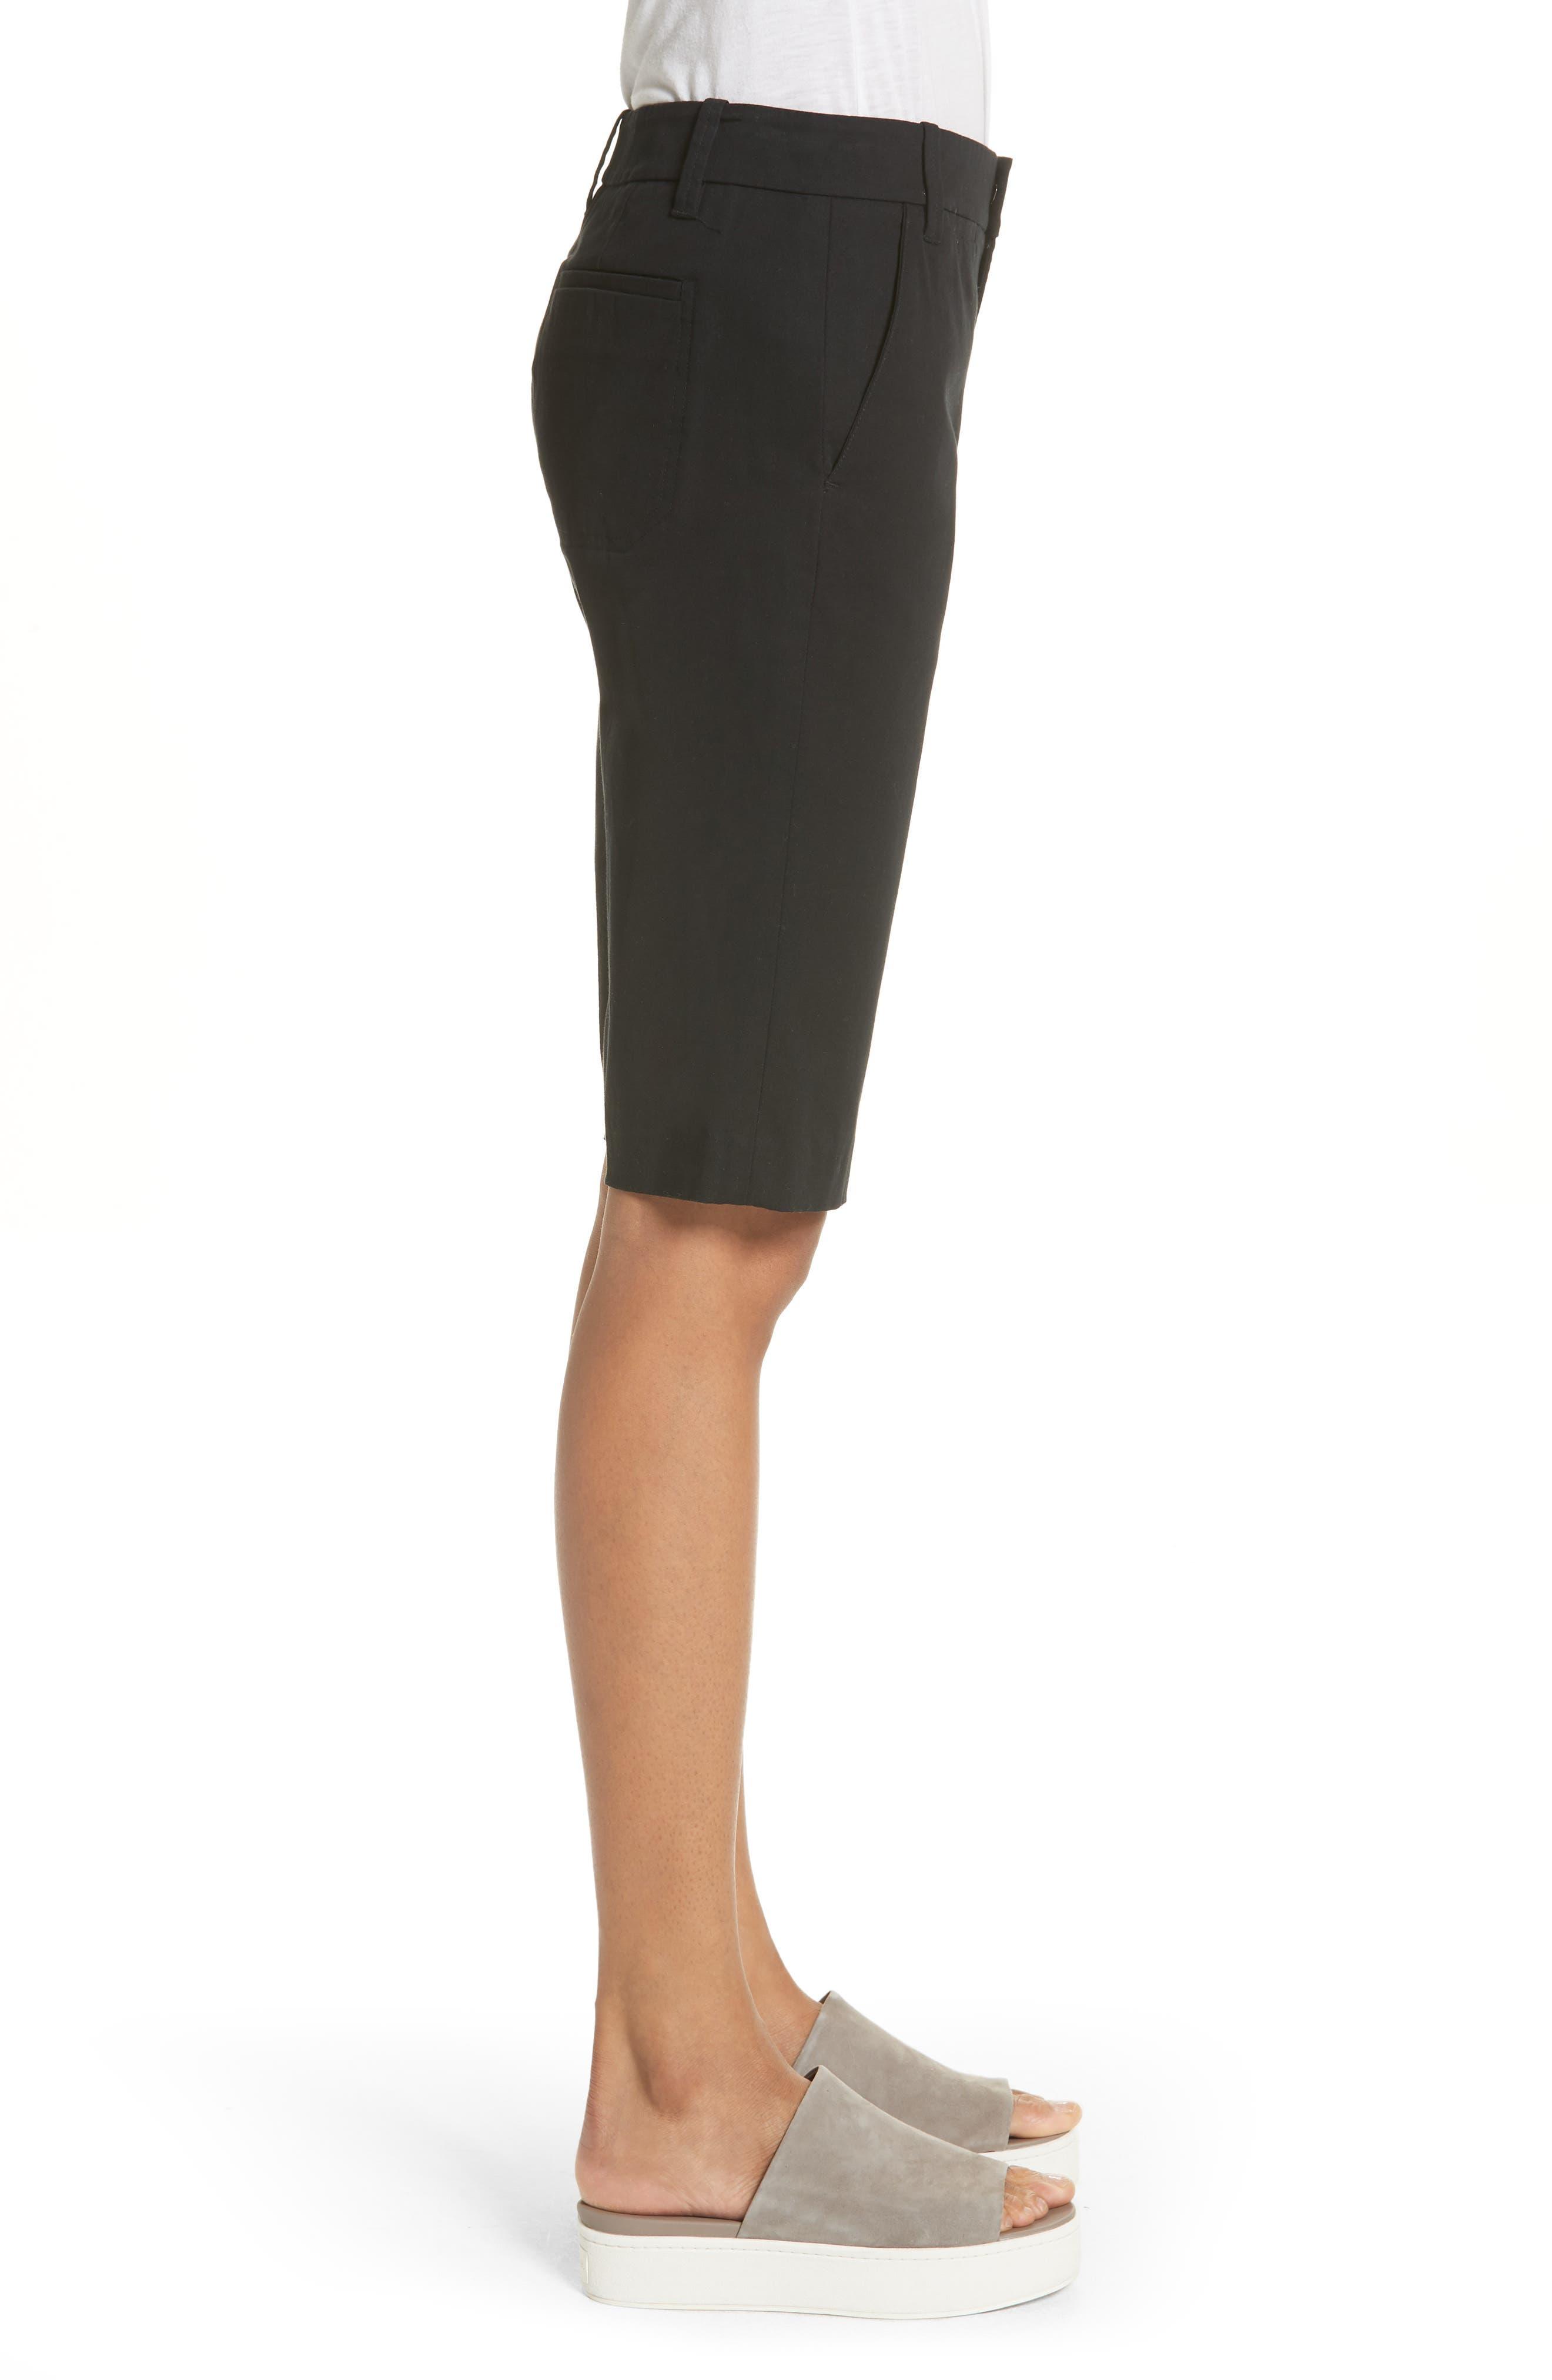 Bermuda Shorts,                             Alternate thumbnail 3, color,                             Black